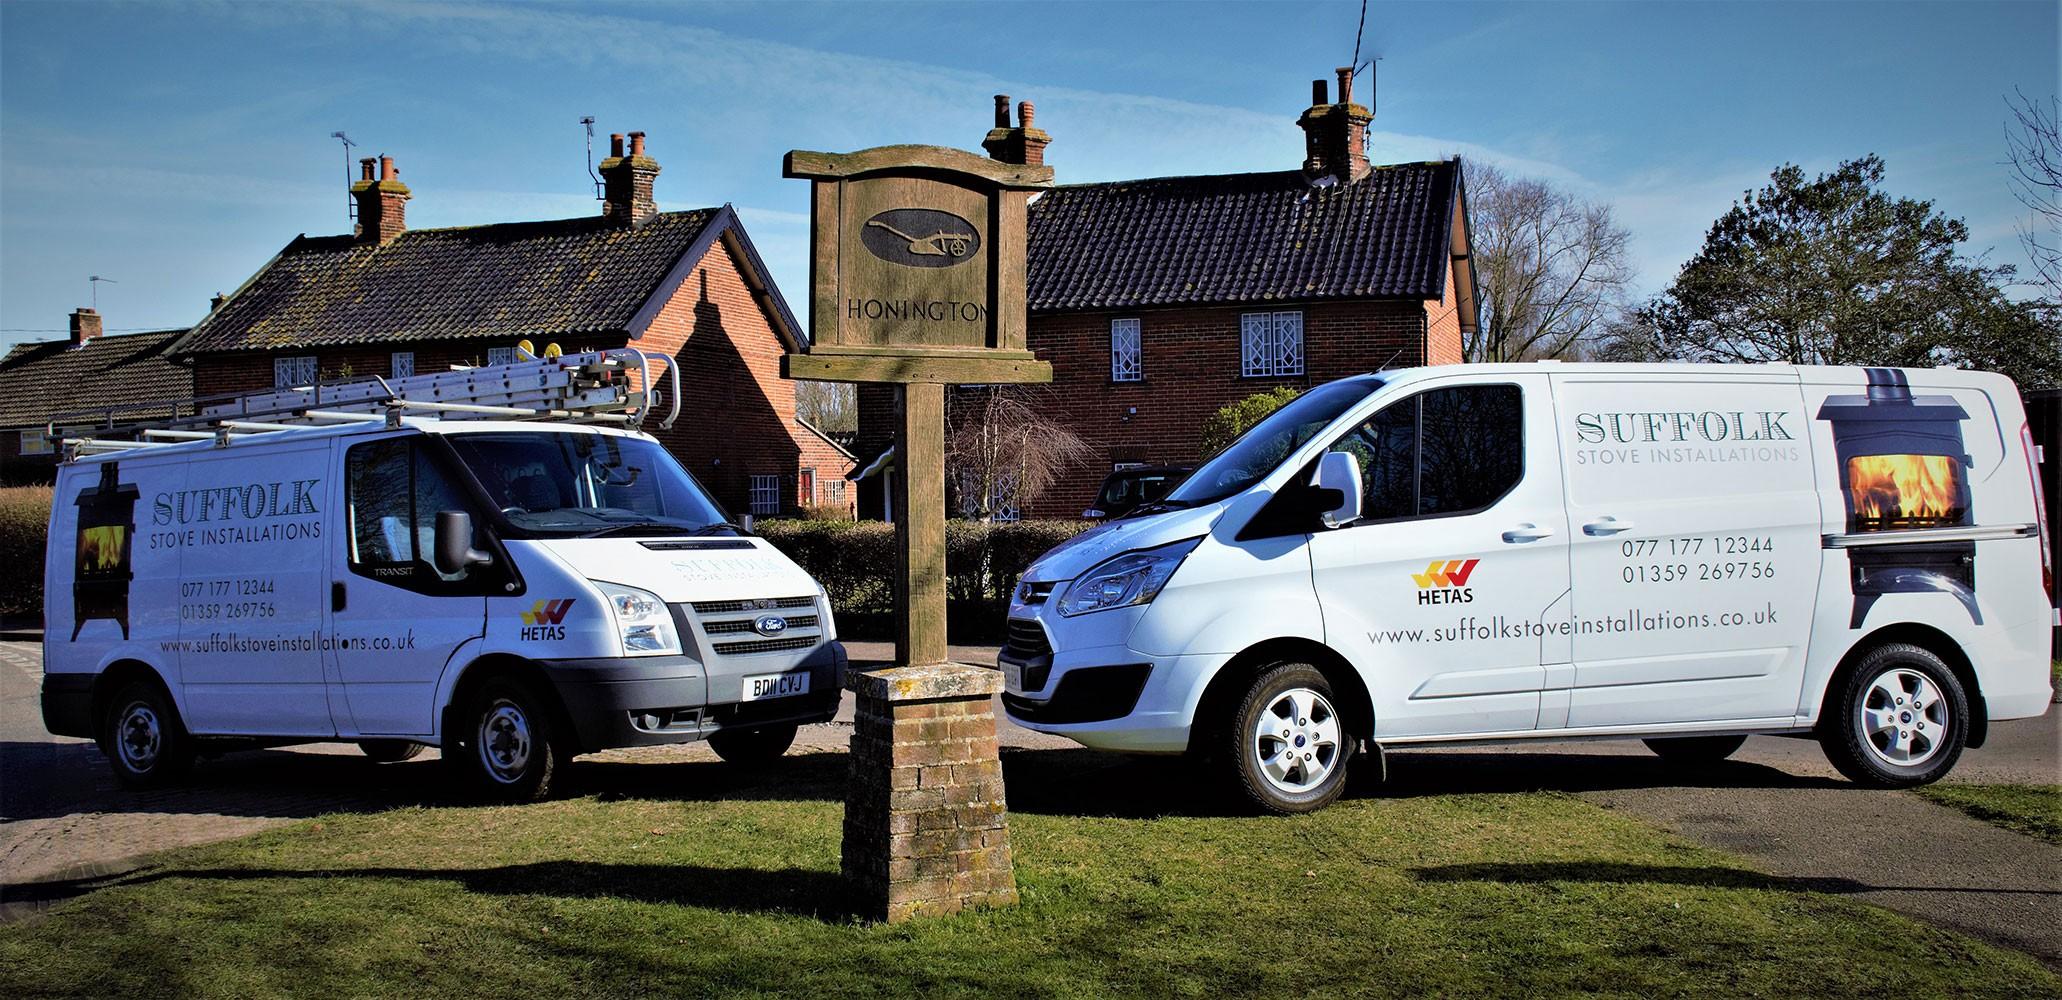 Suffolk Stove Installations Vans